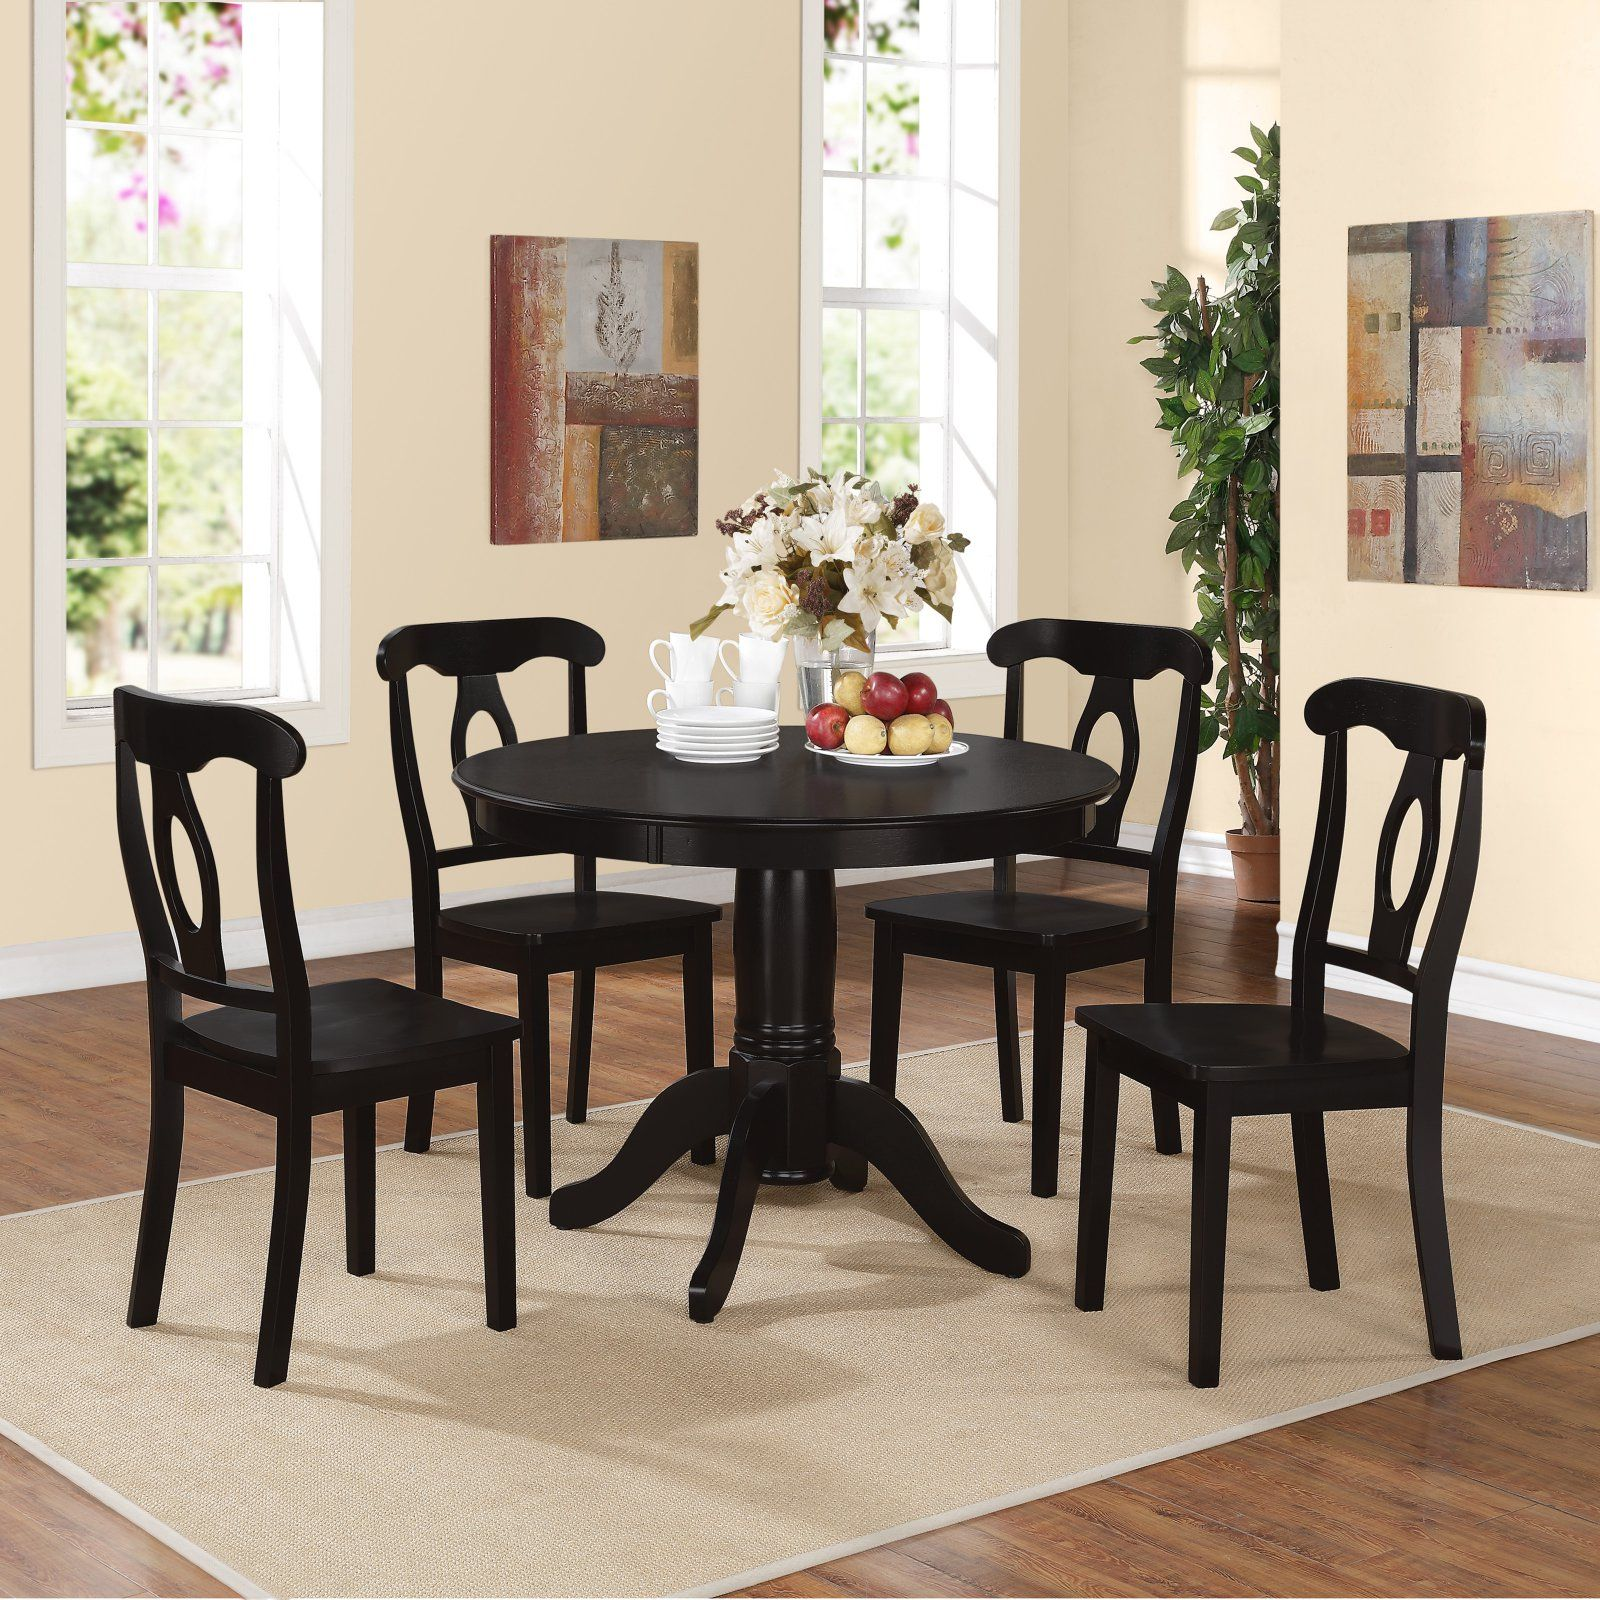 Dorel Living Aubrey 5 Piece Pedestal Dining Set Dining Room Sets